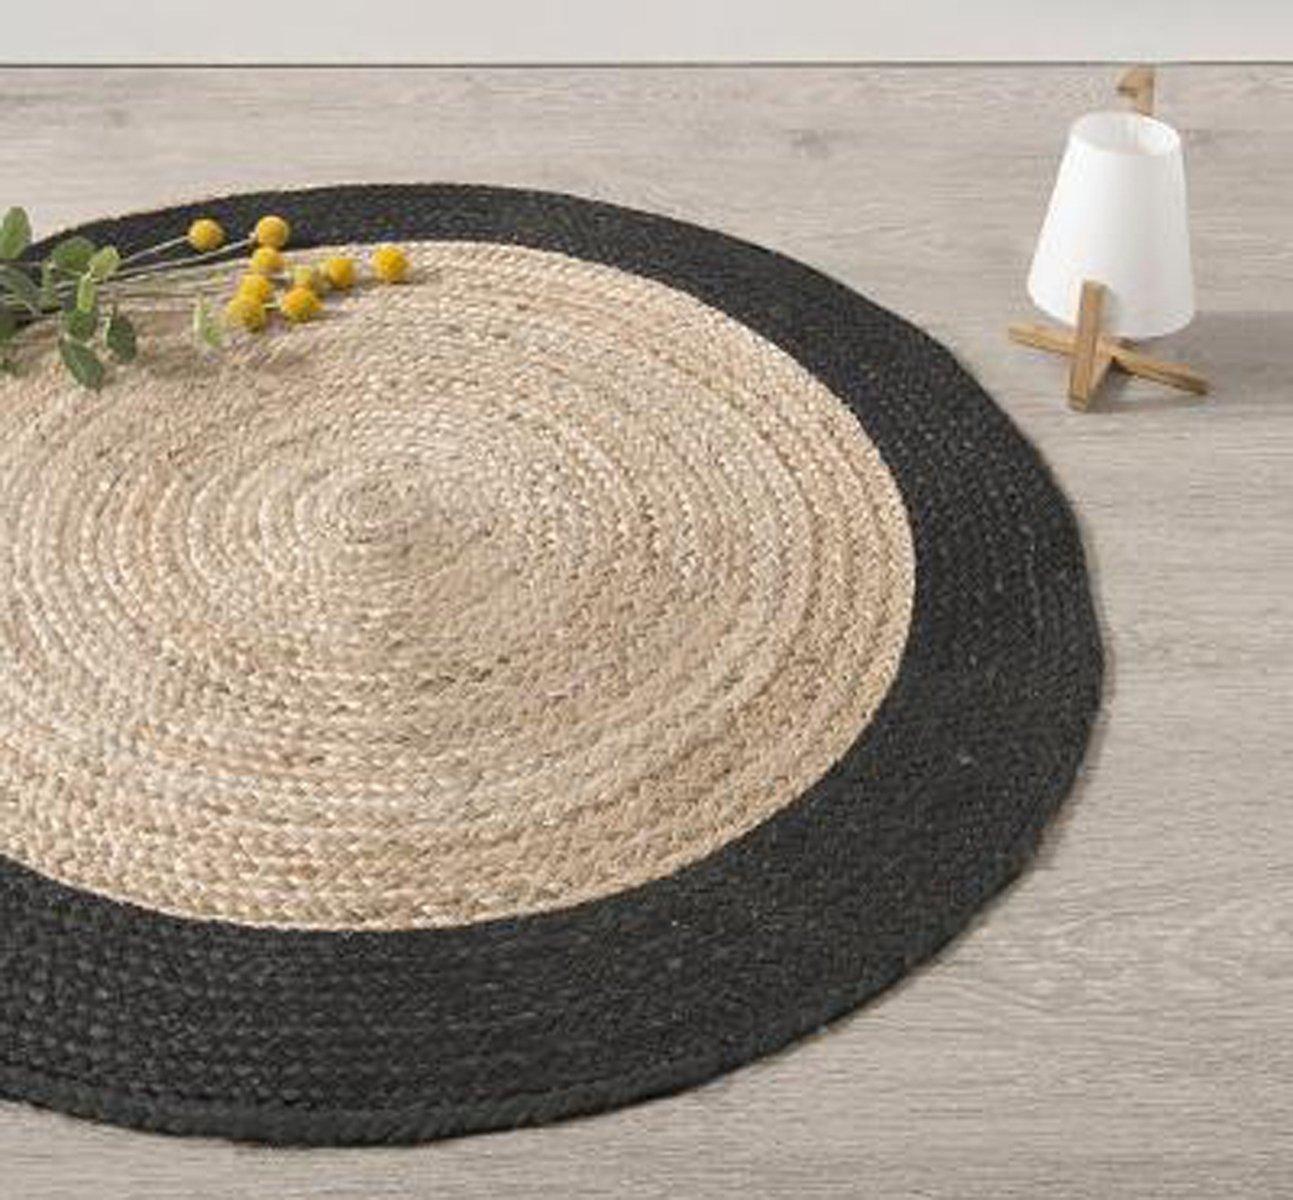 stunning tapis rond en jute naturel et noir diamtre cm pegane with maison du monde tapis rond. Black Bedroom Furniture Sets. Home Design Ideas